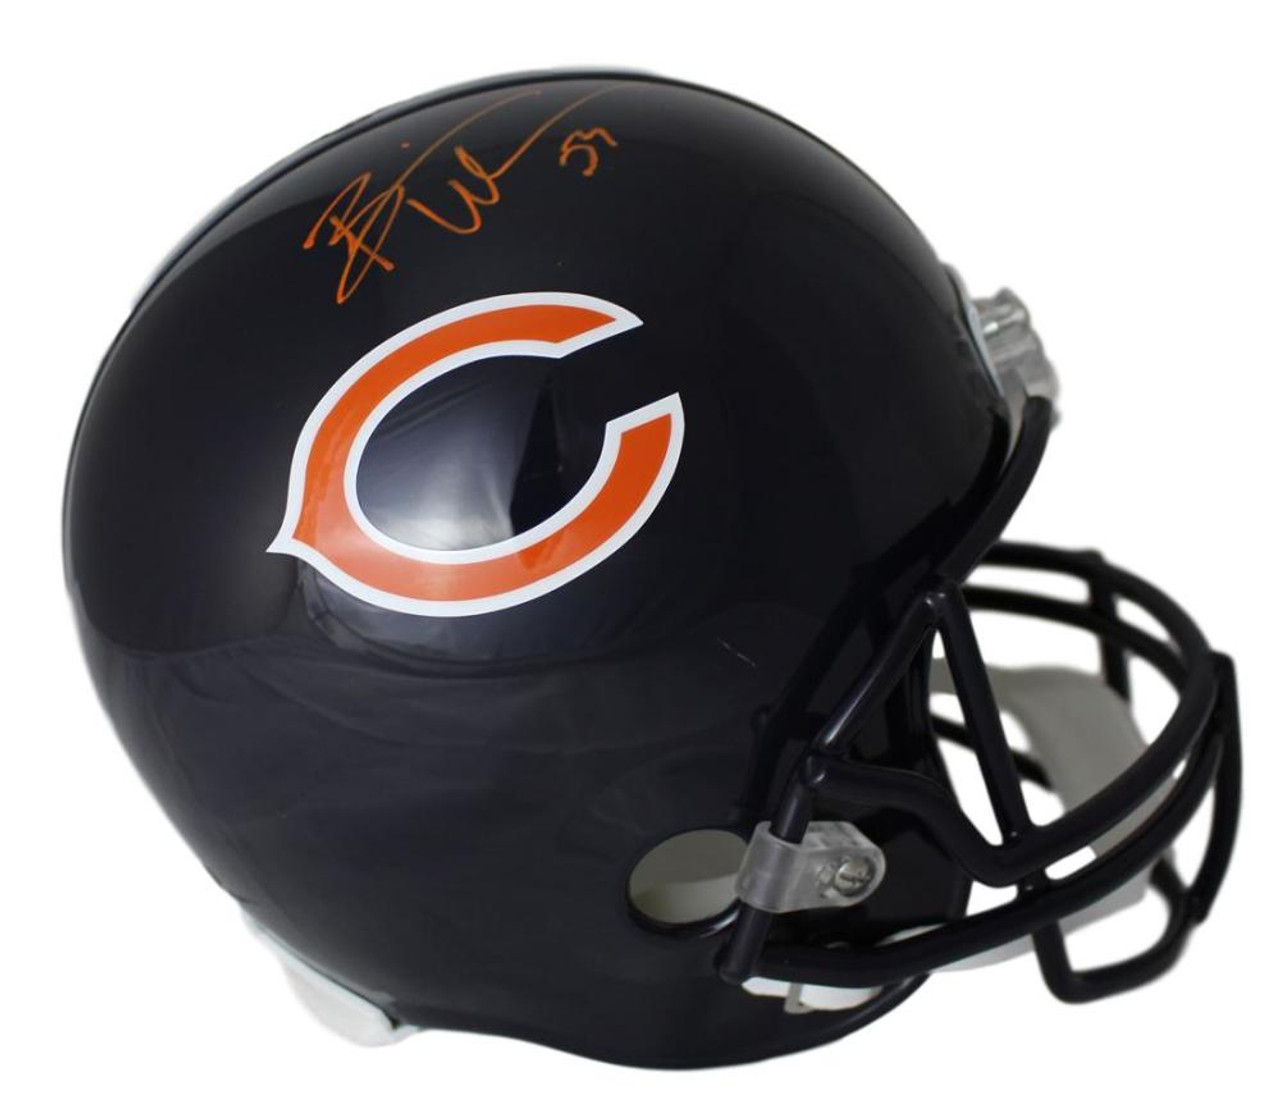 new concept fa53e 98309 Brian Urlacher Autographed Chicago Bears Replica Helmet JSA Certificate of  Authenticity